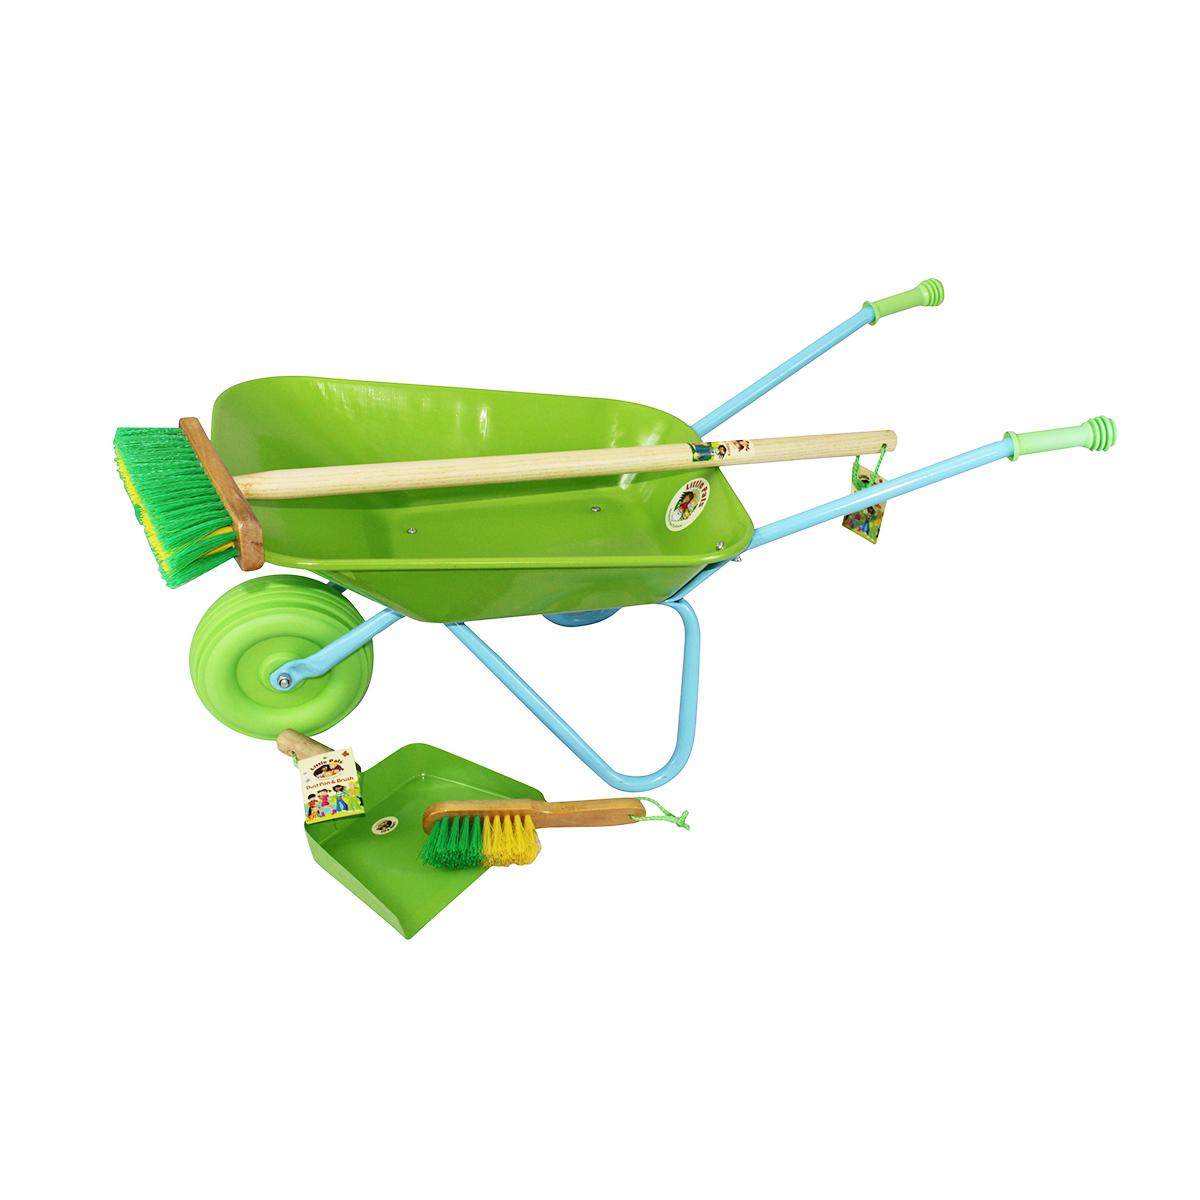 Wheelbarrow and Sweep Up Set